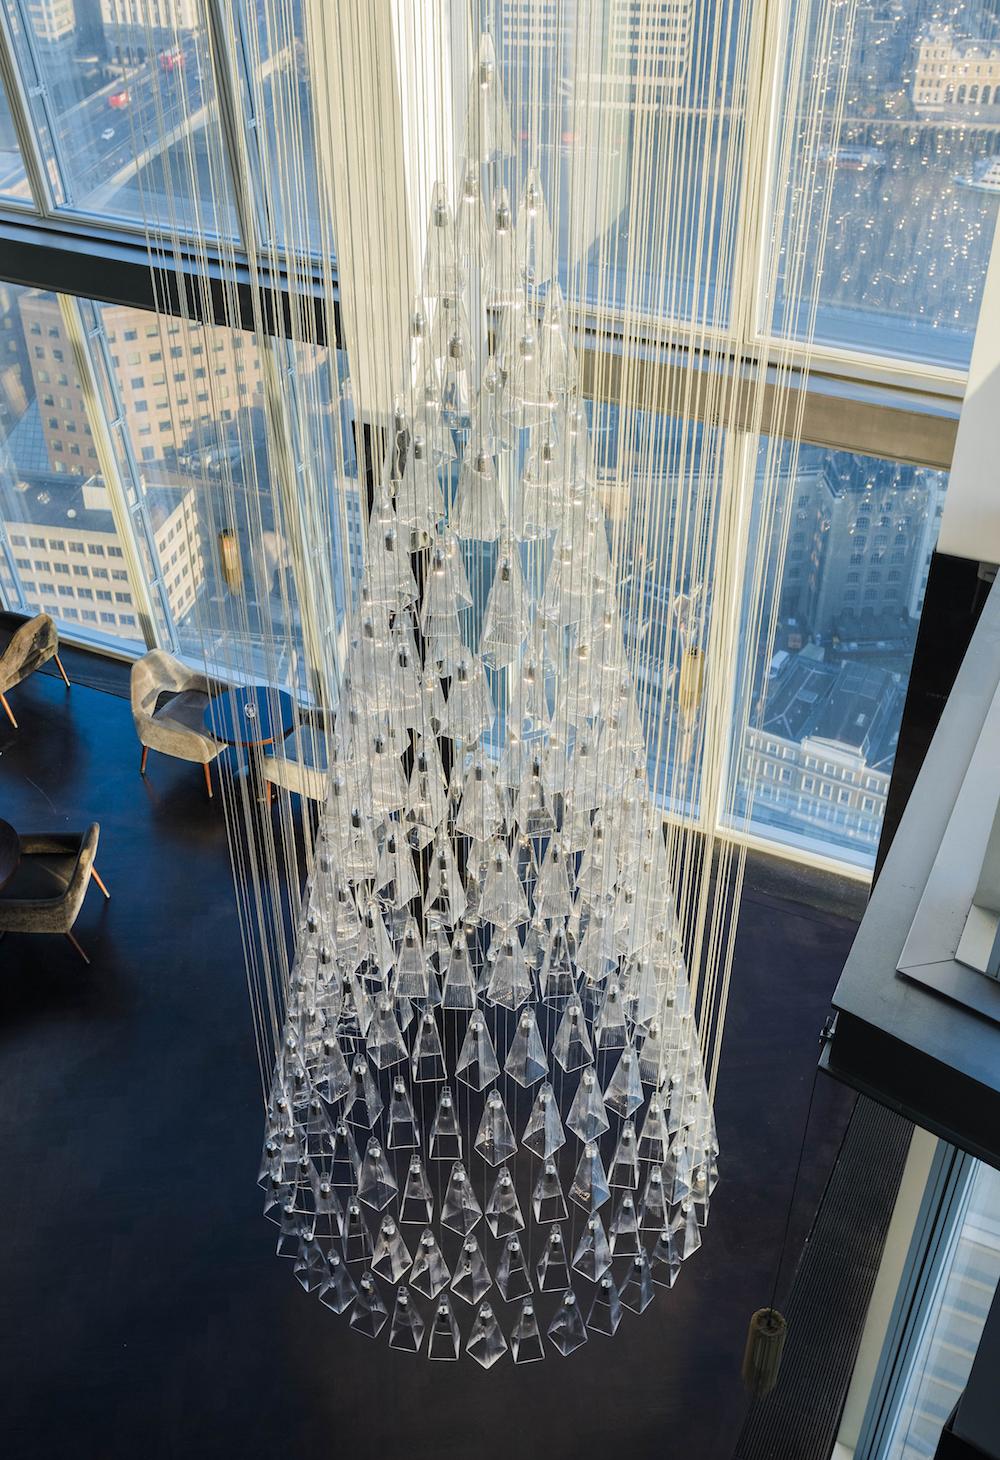 17 Lee Broom 'The Tree of Glass' at aqua shard (Photo Credit David Cleveland).jpg